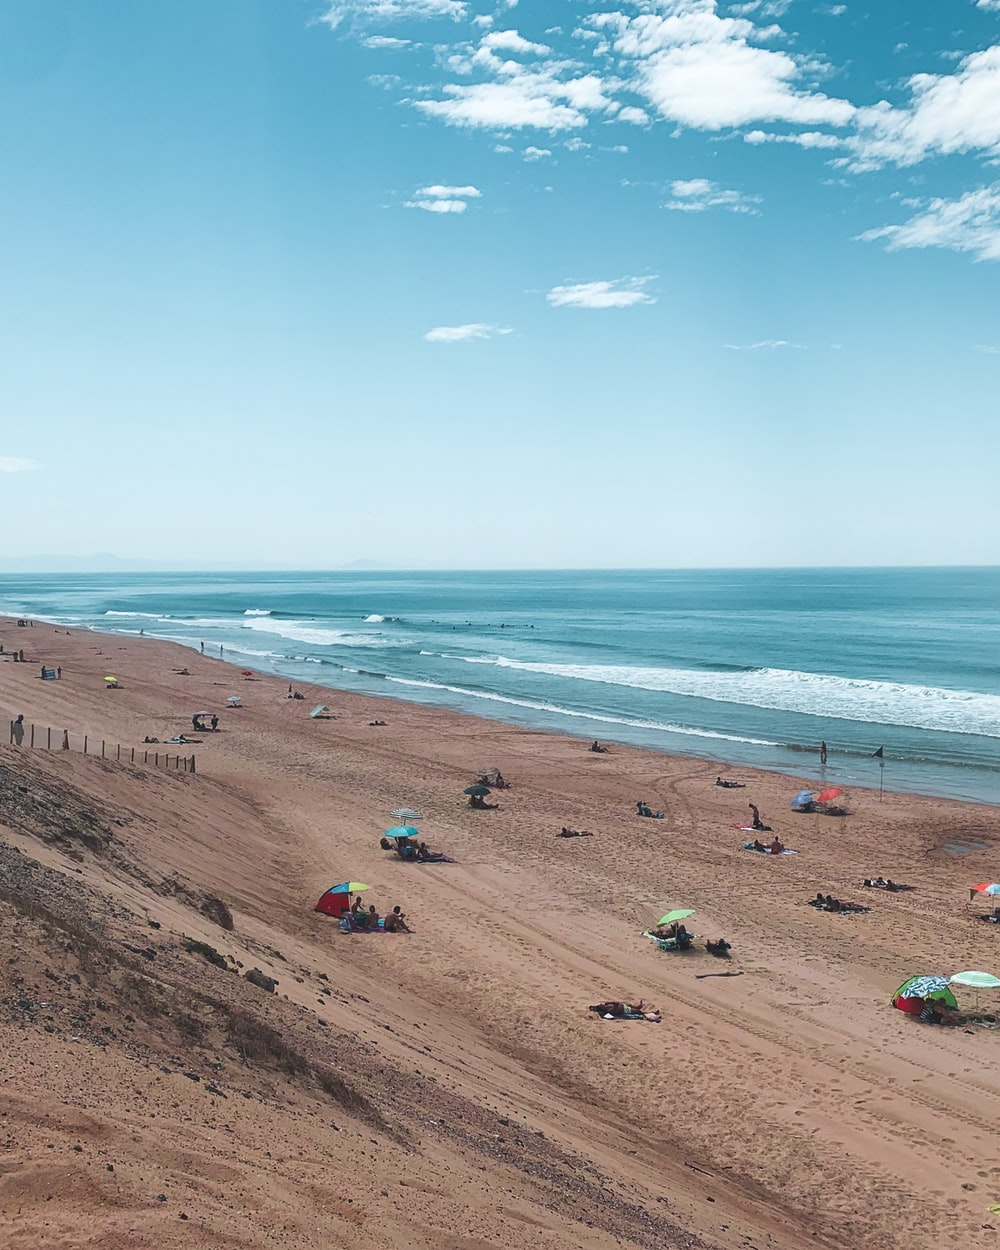 people in sea shore under blue sky